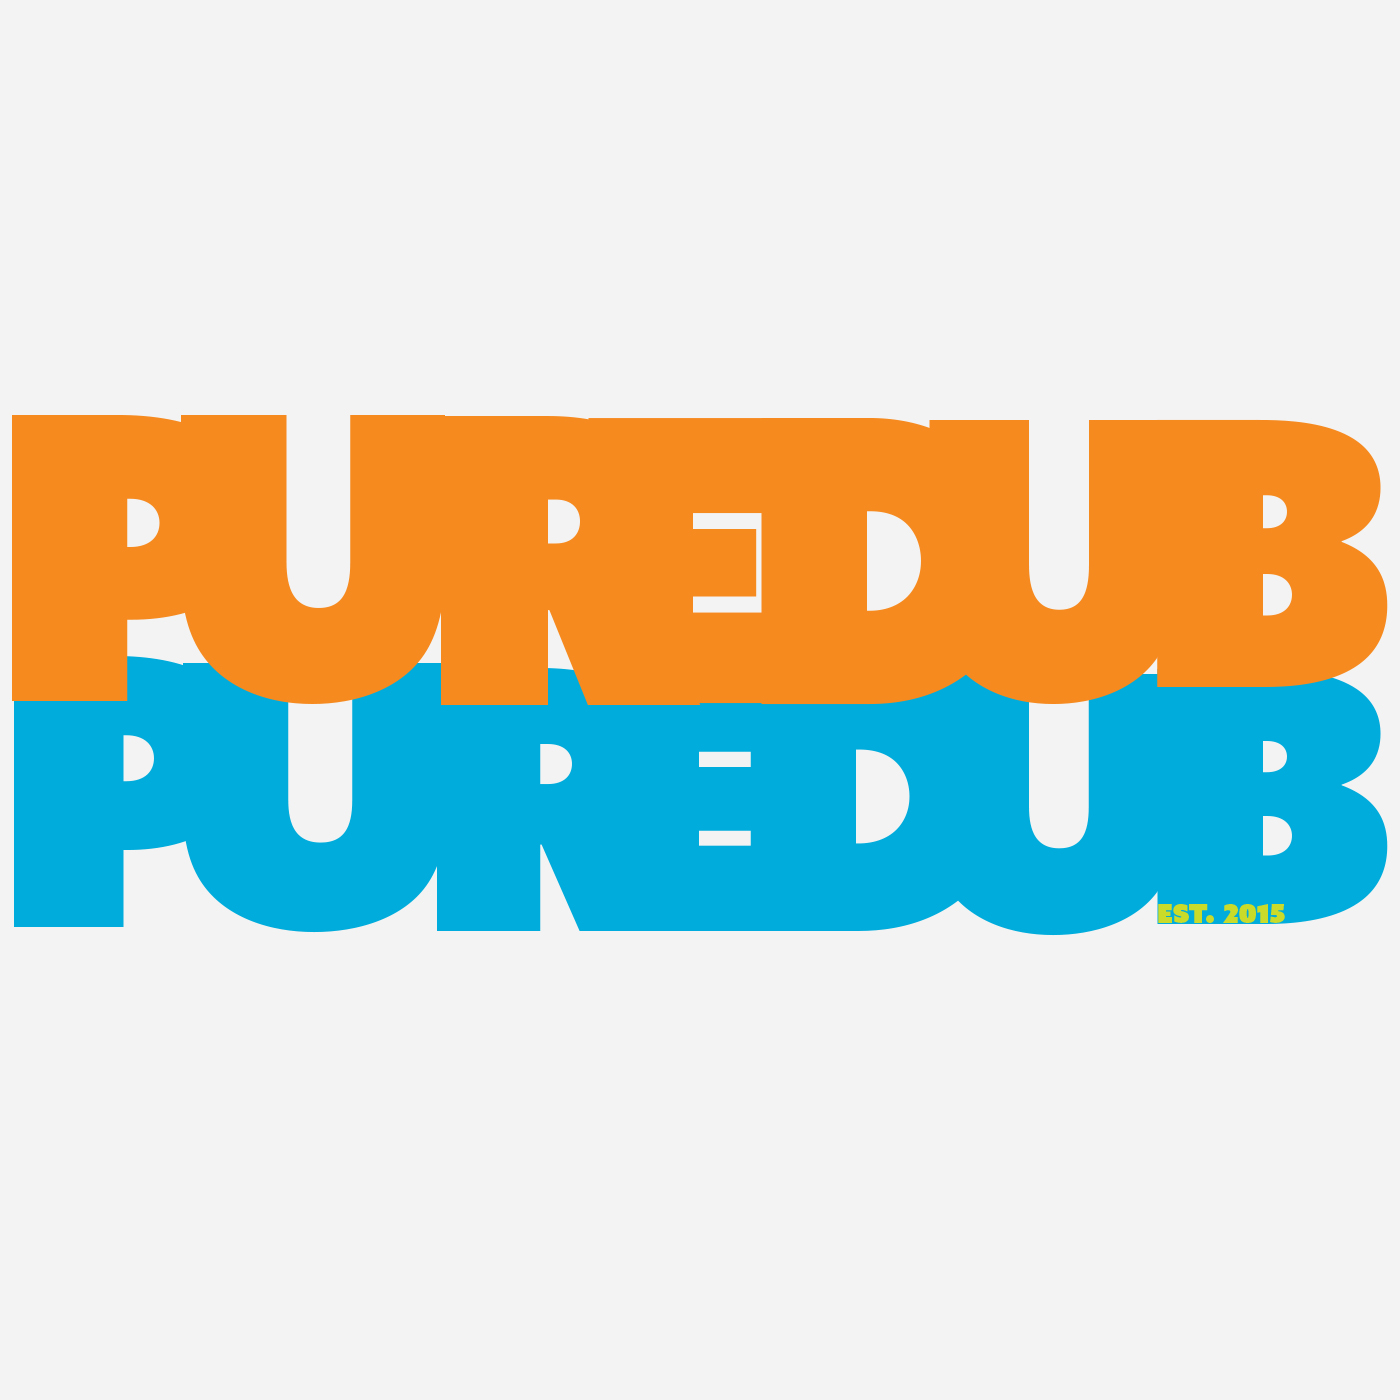 PUREDUB